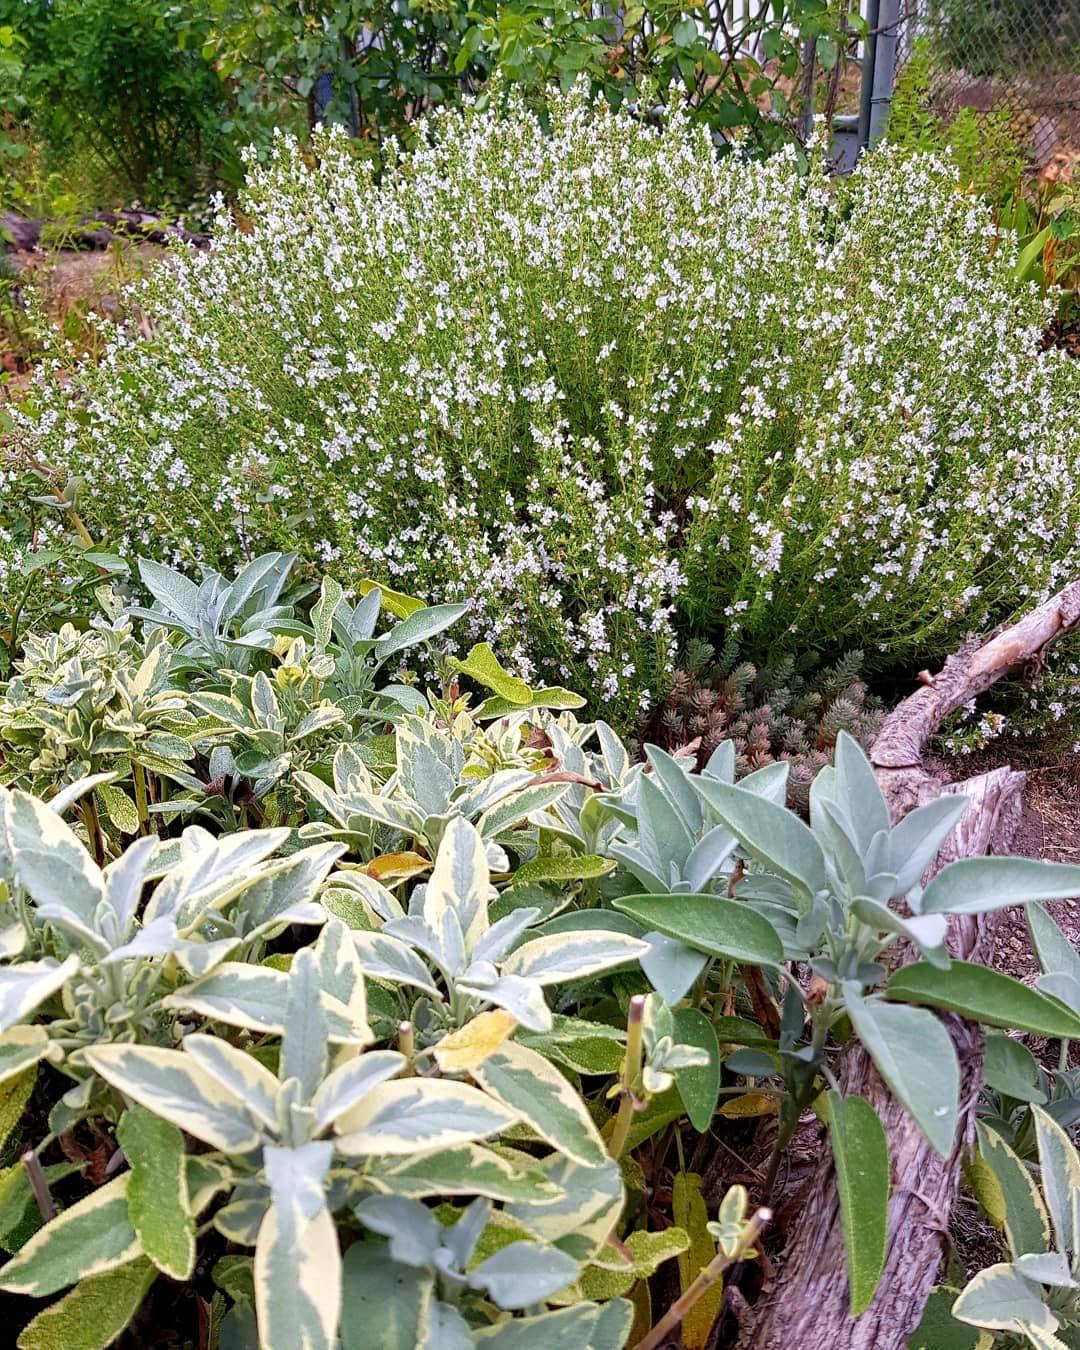 25 Idees Inspirantes De Clotures En Bois Modernes Pour Embellir Votre Cour Arriere Garten Deko Garten Gartenarbeit